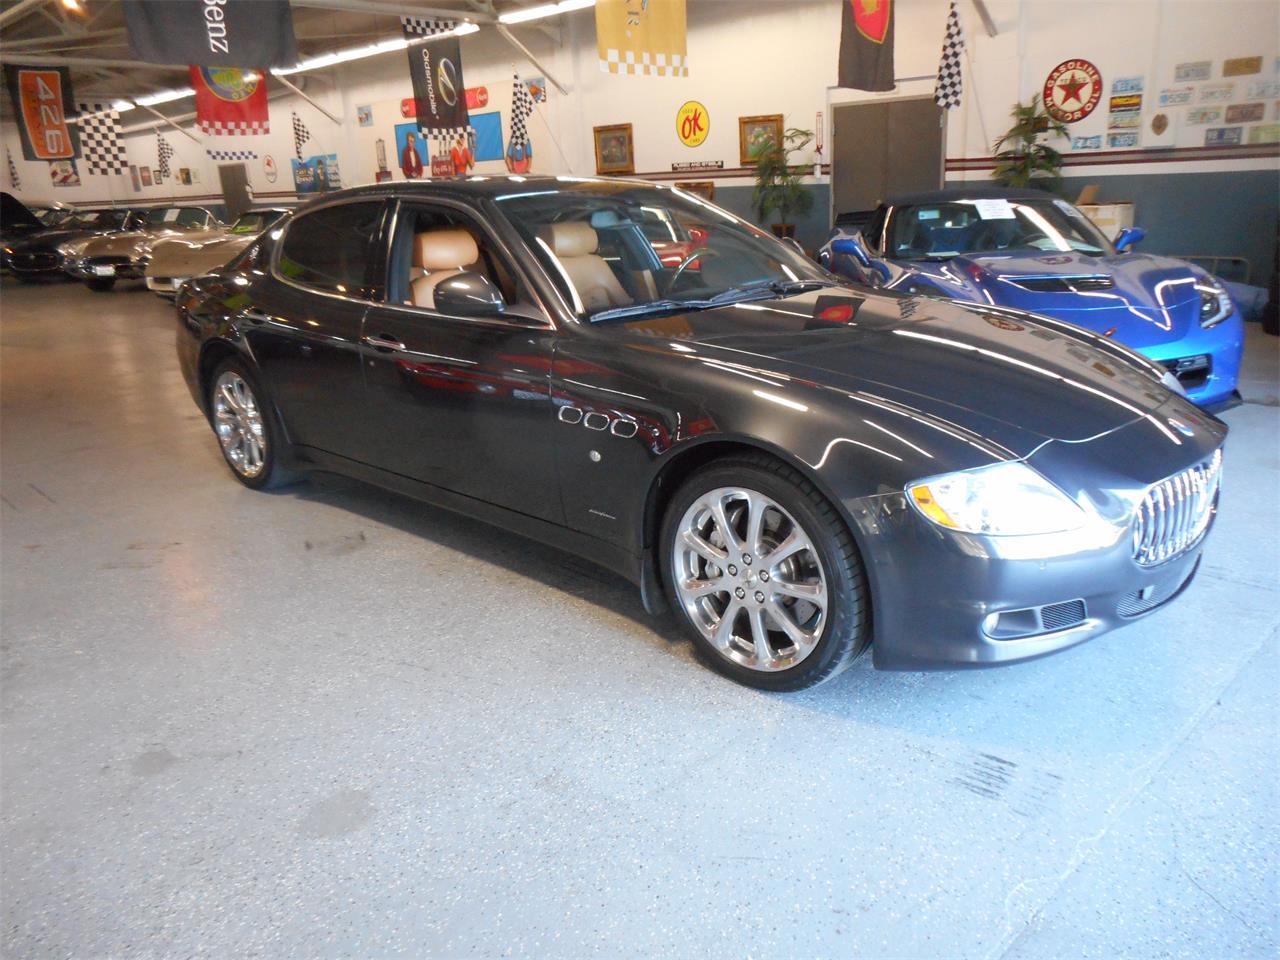 2009 Maserati Quattroporte for Sale | ClassicCars.com | CC ...